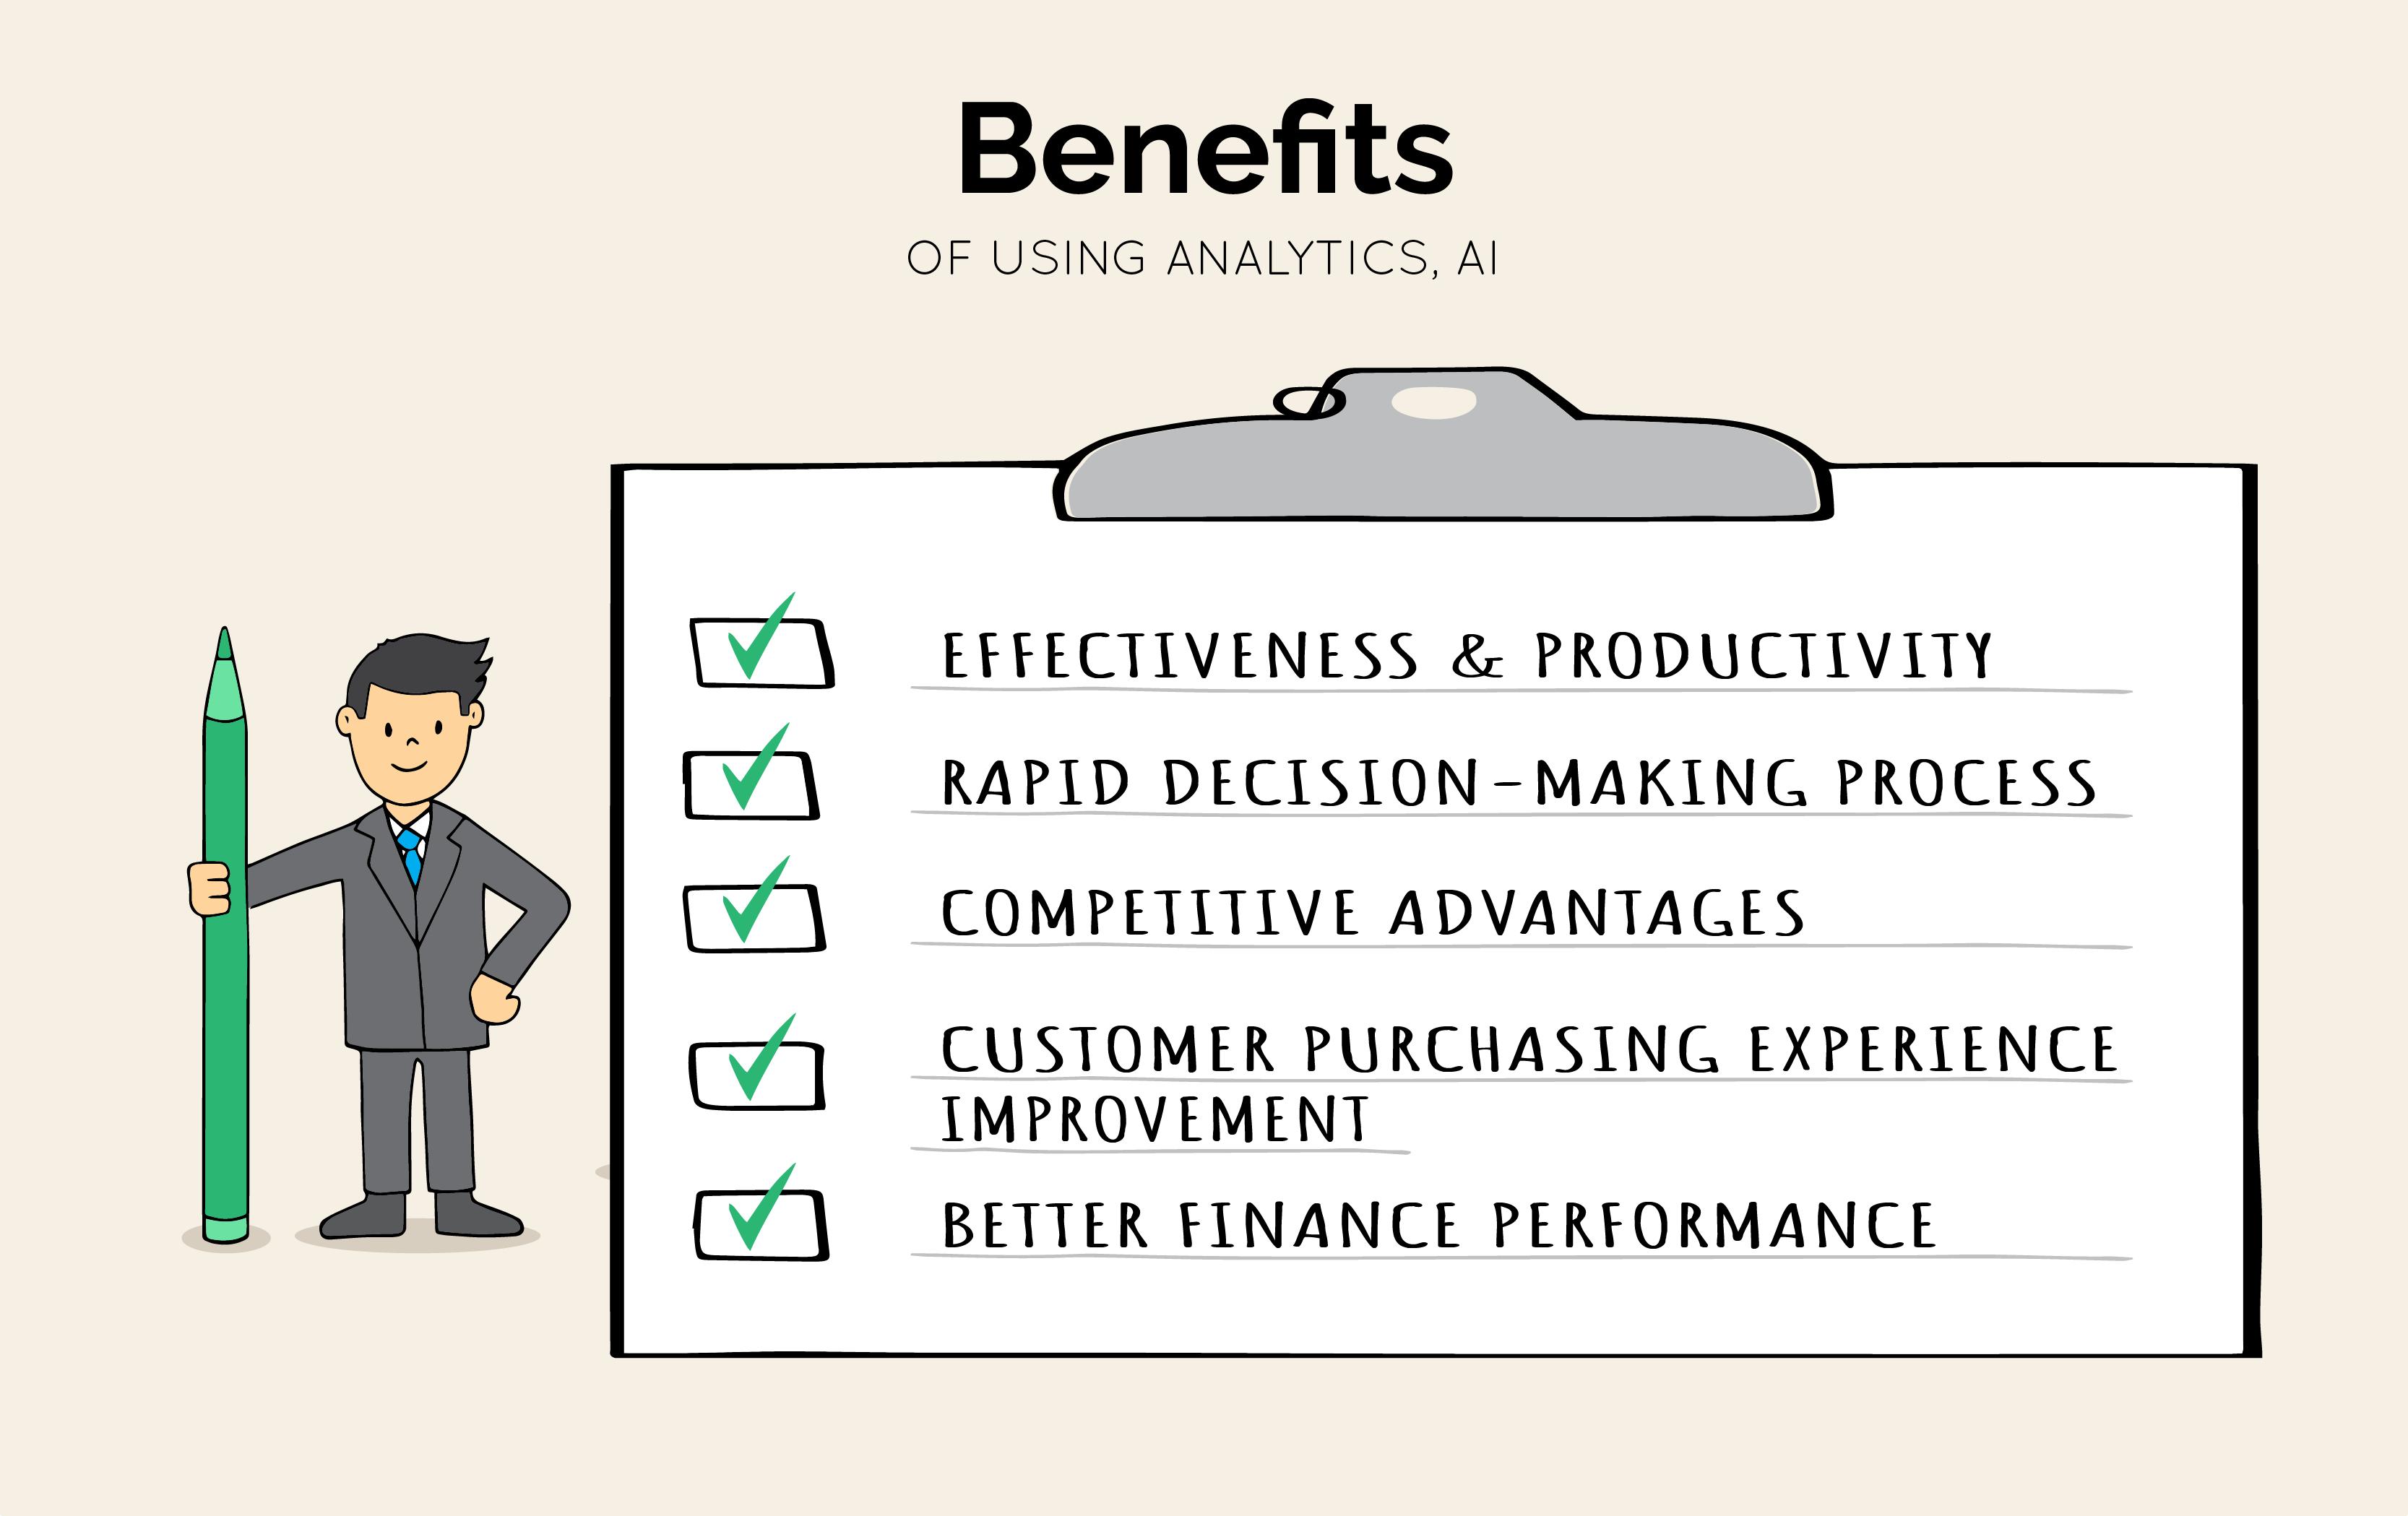 analytic-benefits